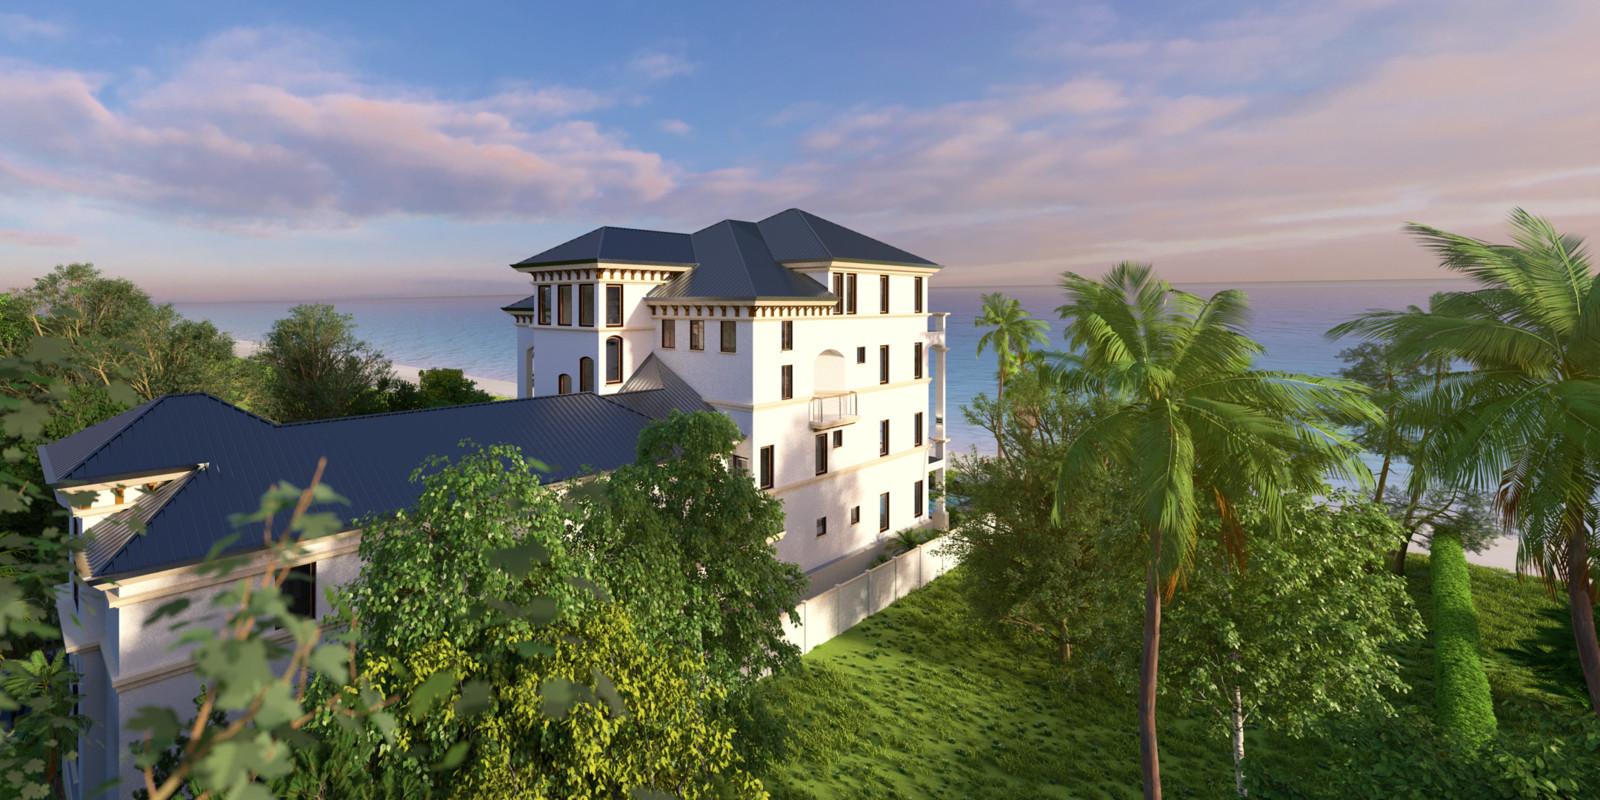 SketchUp + Thea Render  Seagrove Beach House: Scene 11A B Bob Early 2160 × 1080 Presto MC Bucket